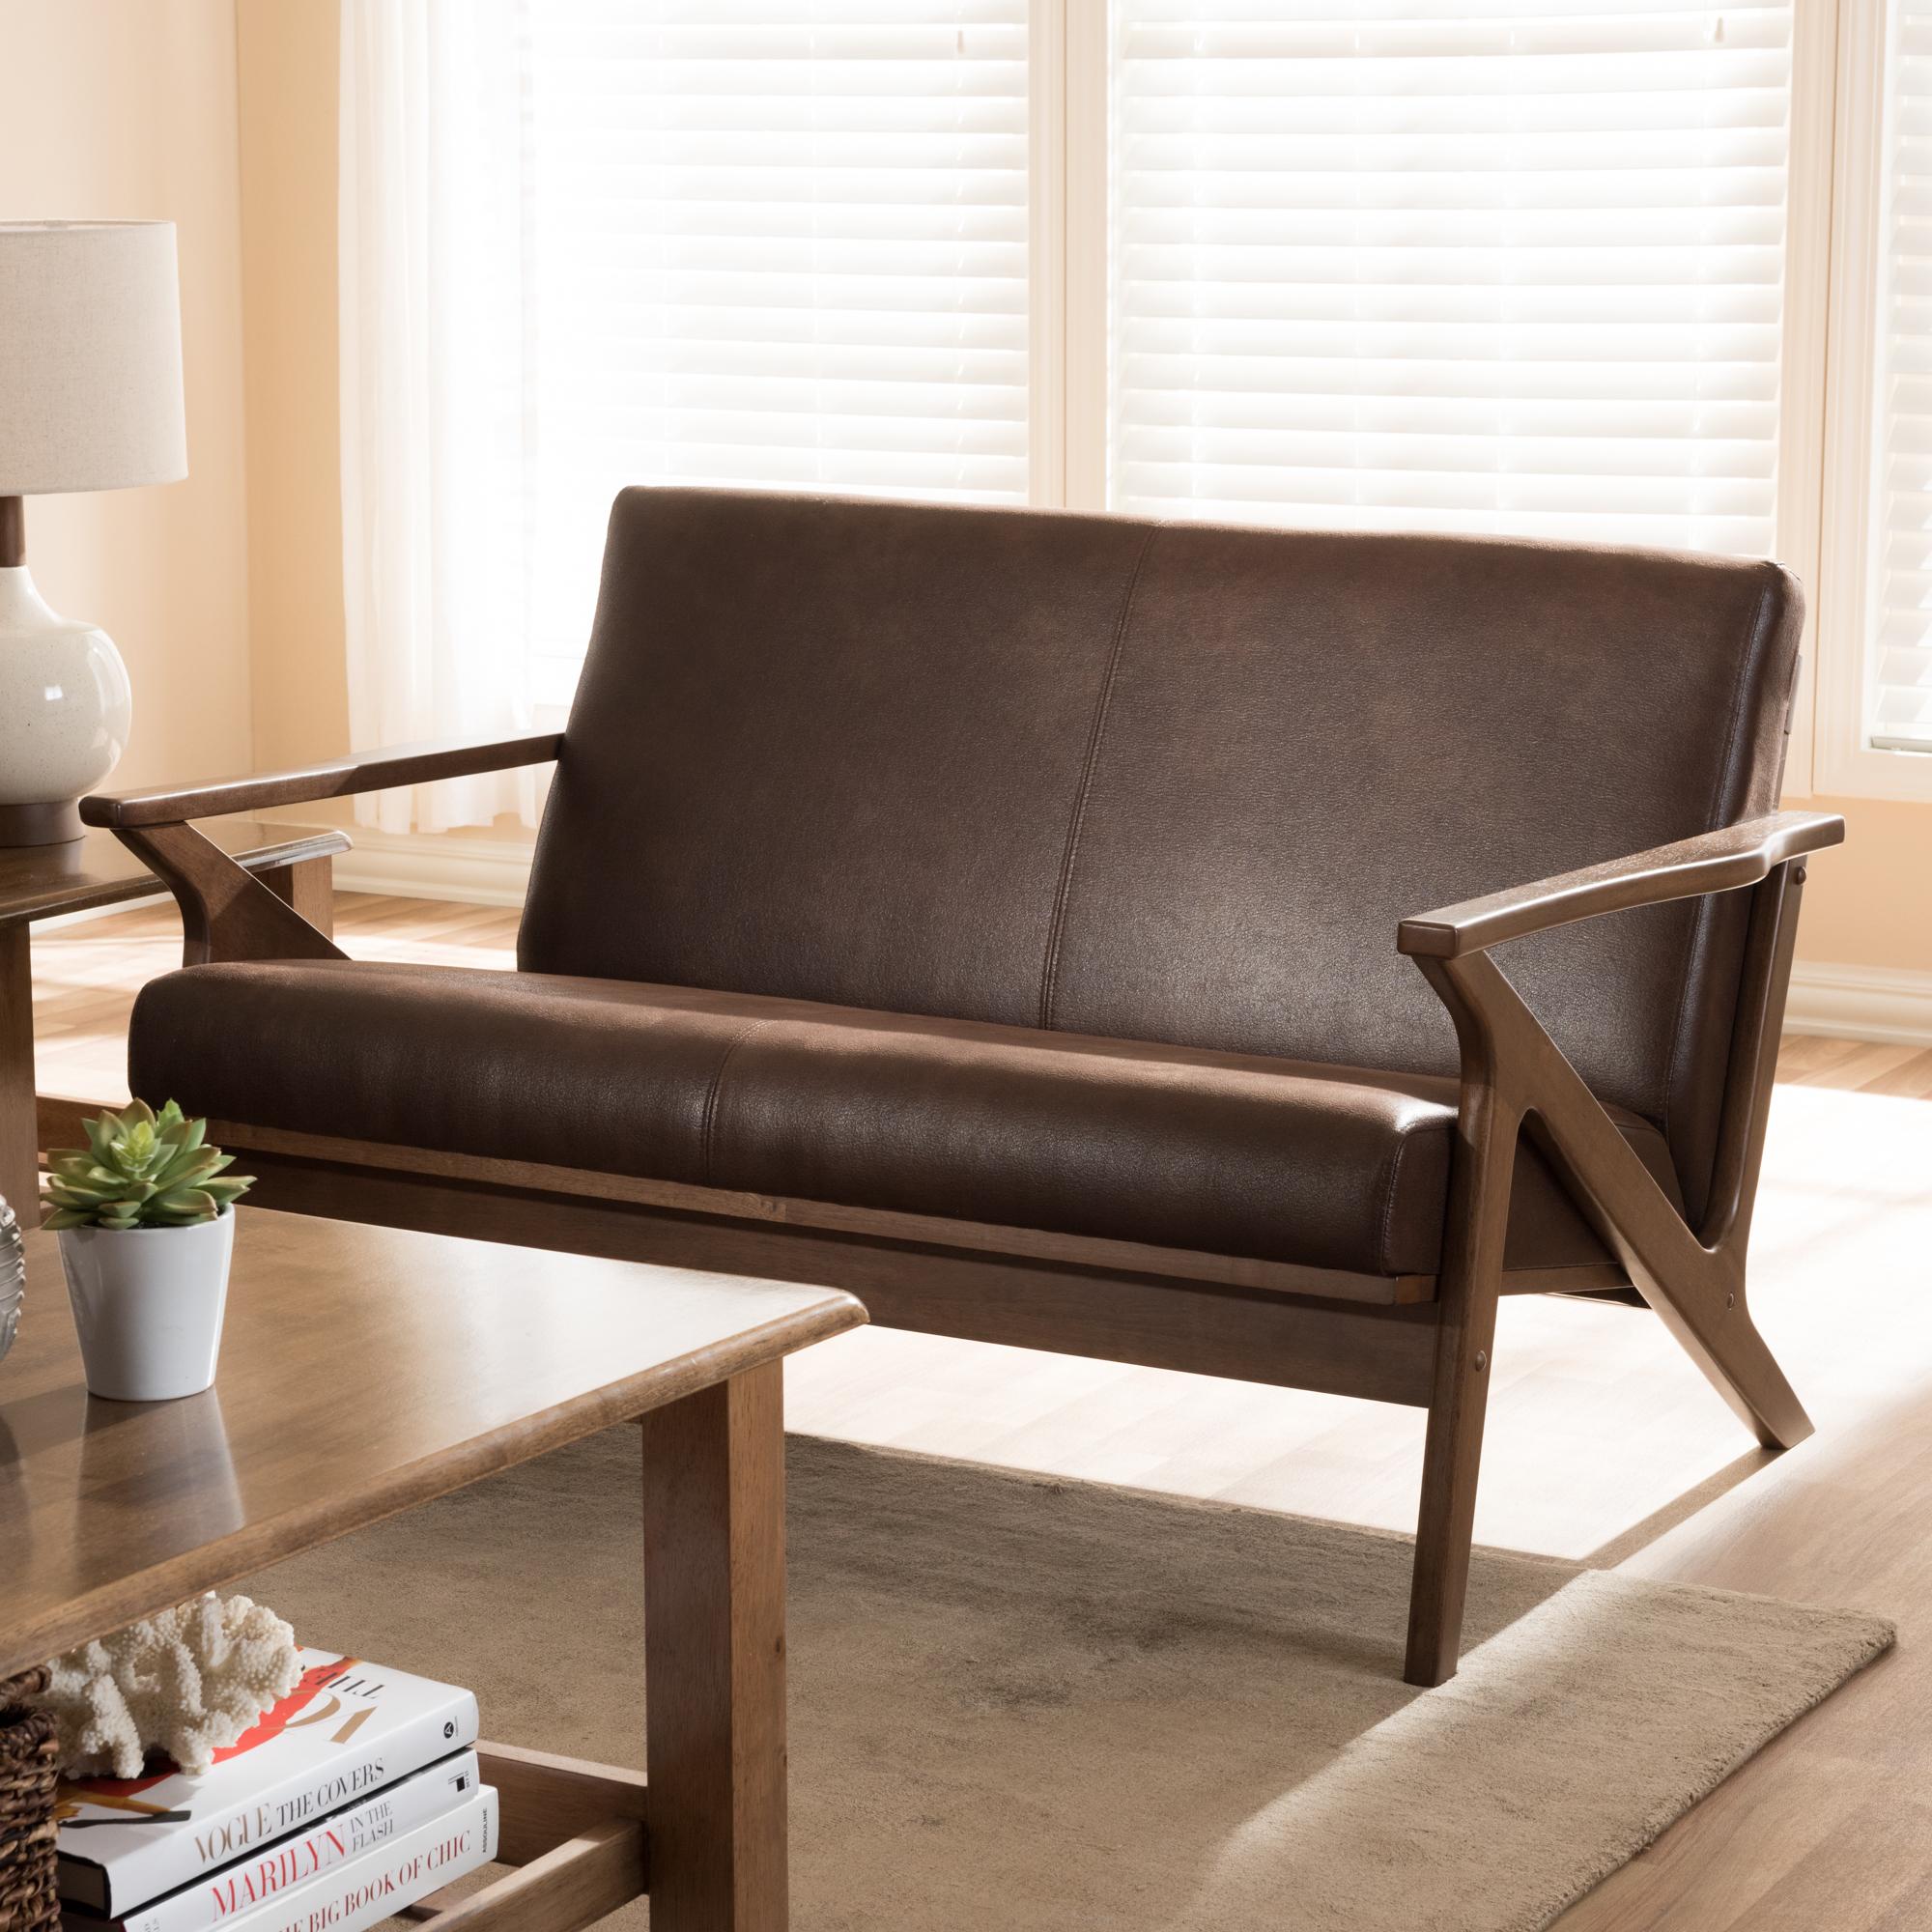 ... Baxton Studio Bianca Mid Century Modern Walnut Wood Dark Brown  Distressed Faux Leather 2  ...